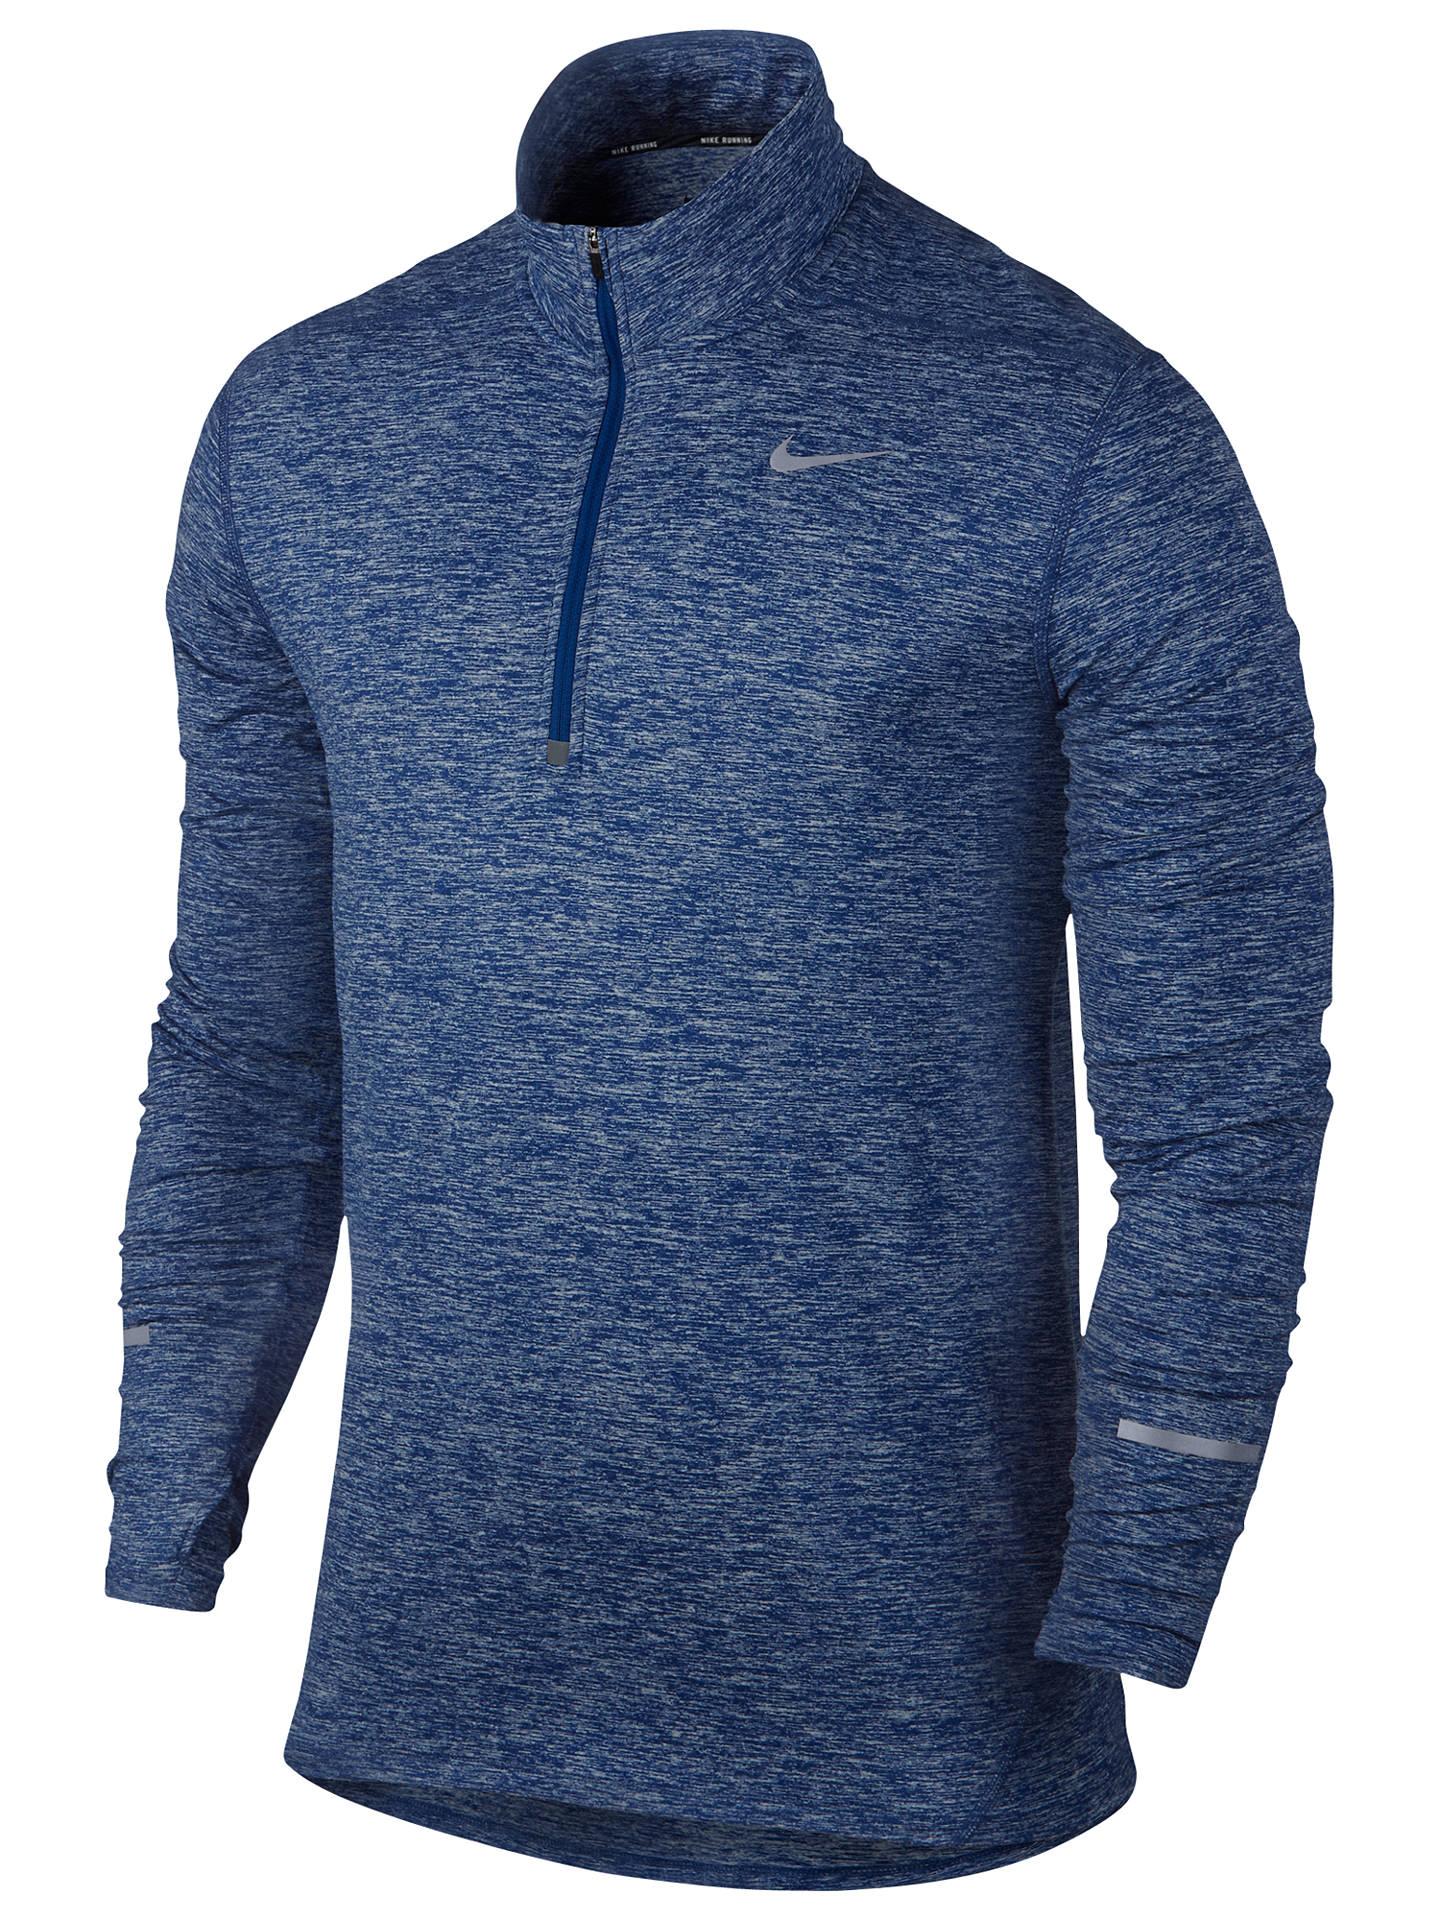 nike flash dri fit reflective running pullover